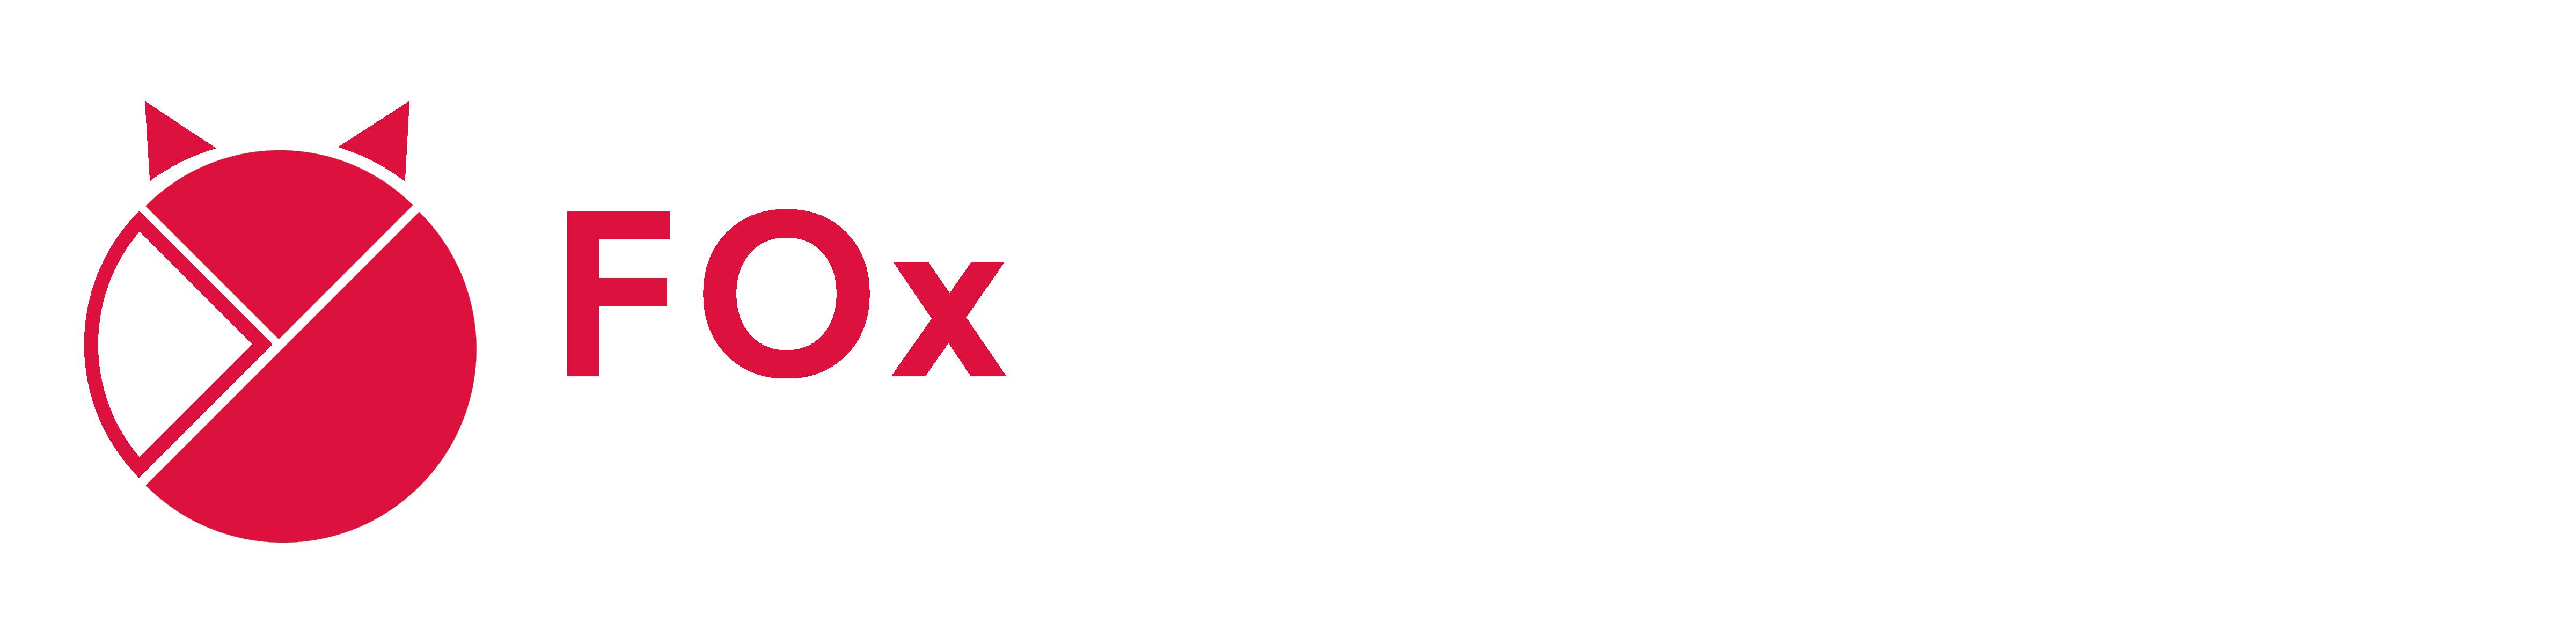 FOx BIOSYSTEMS